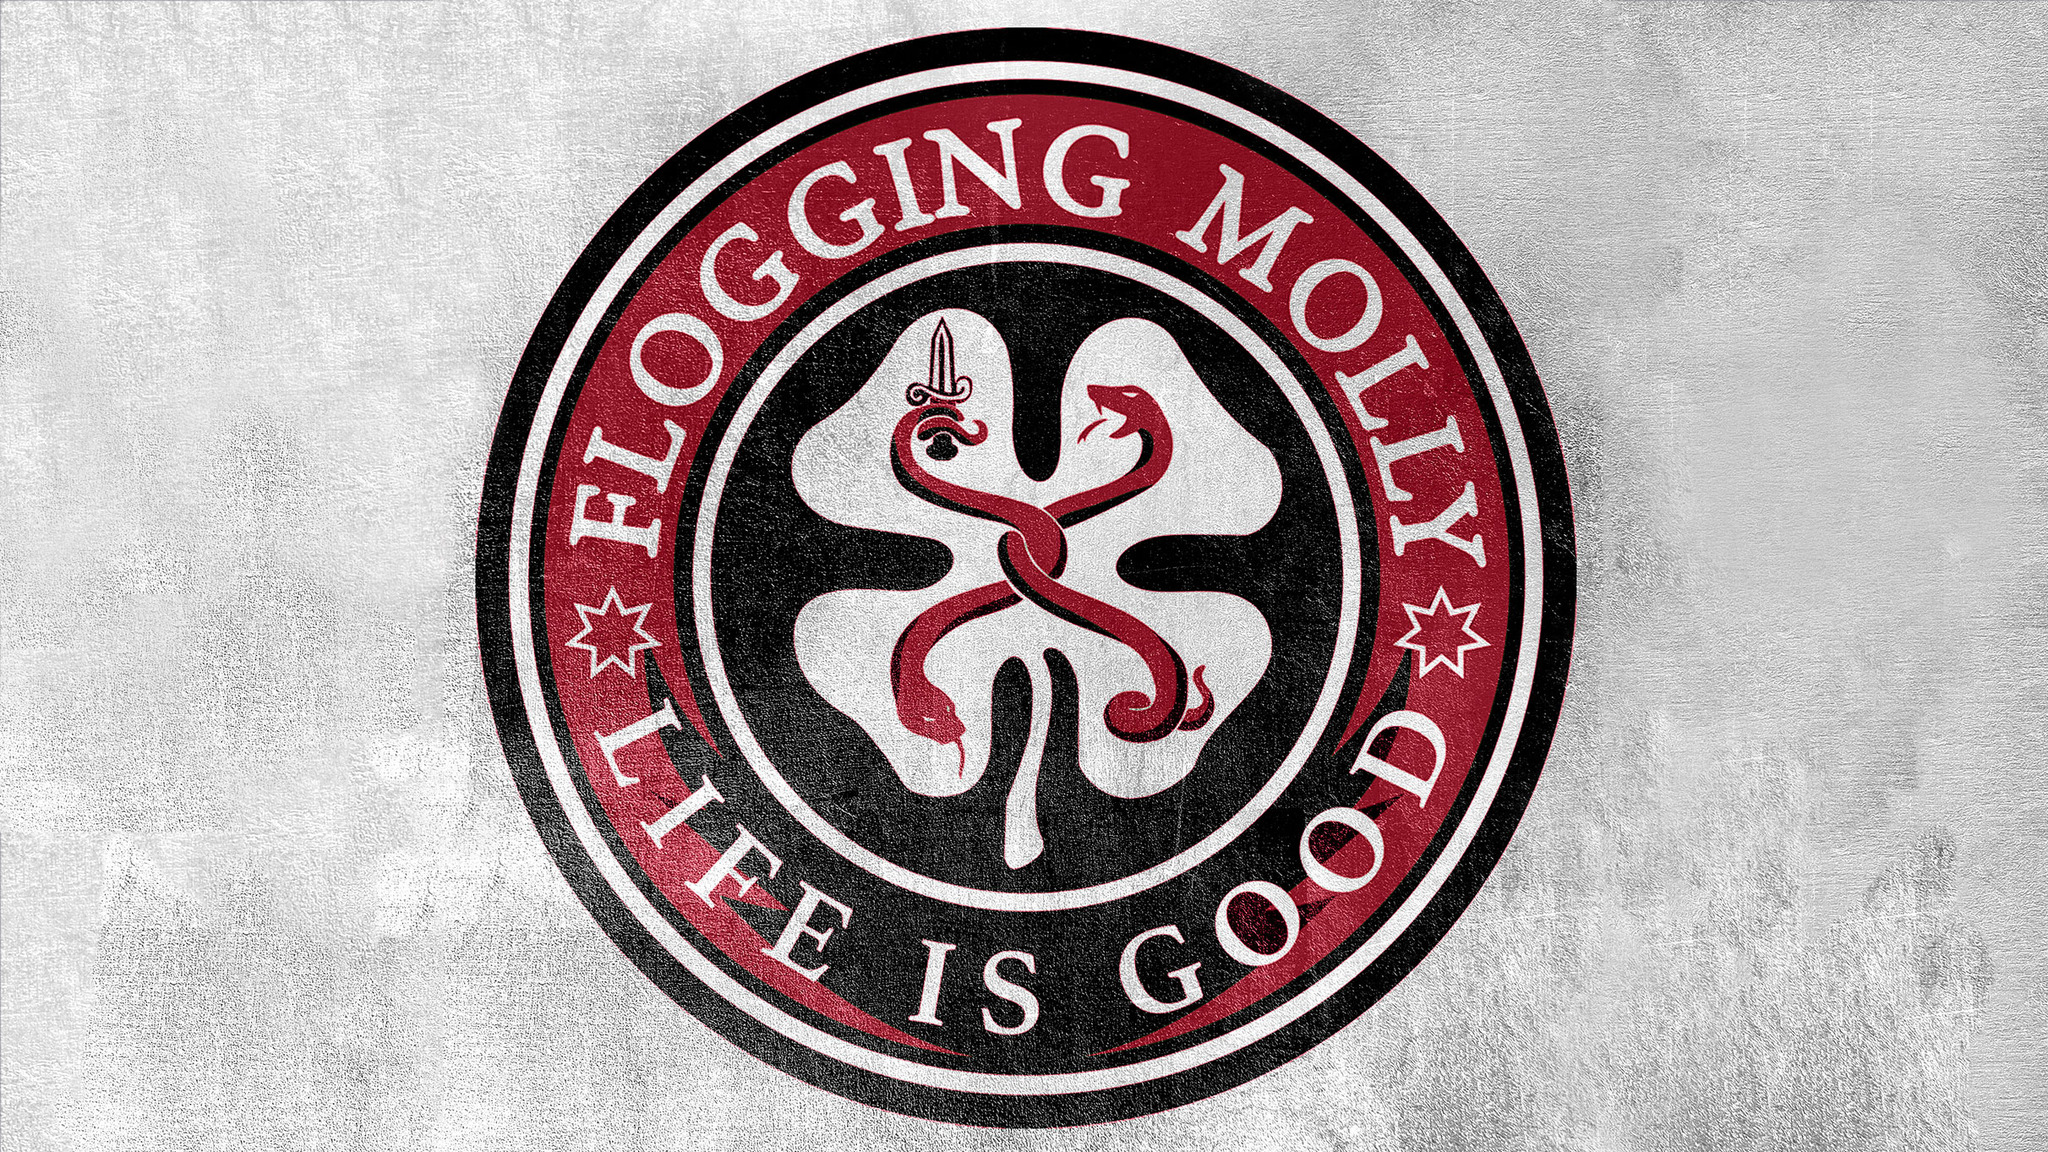 Flogging Molly and Dropkick Murphys